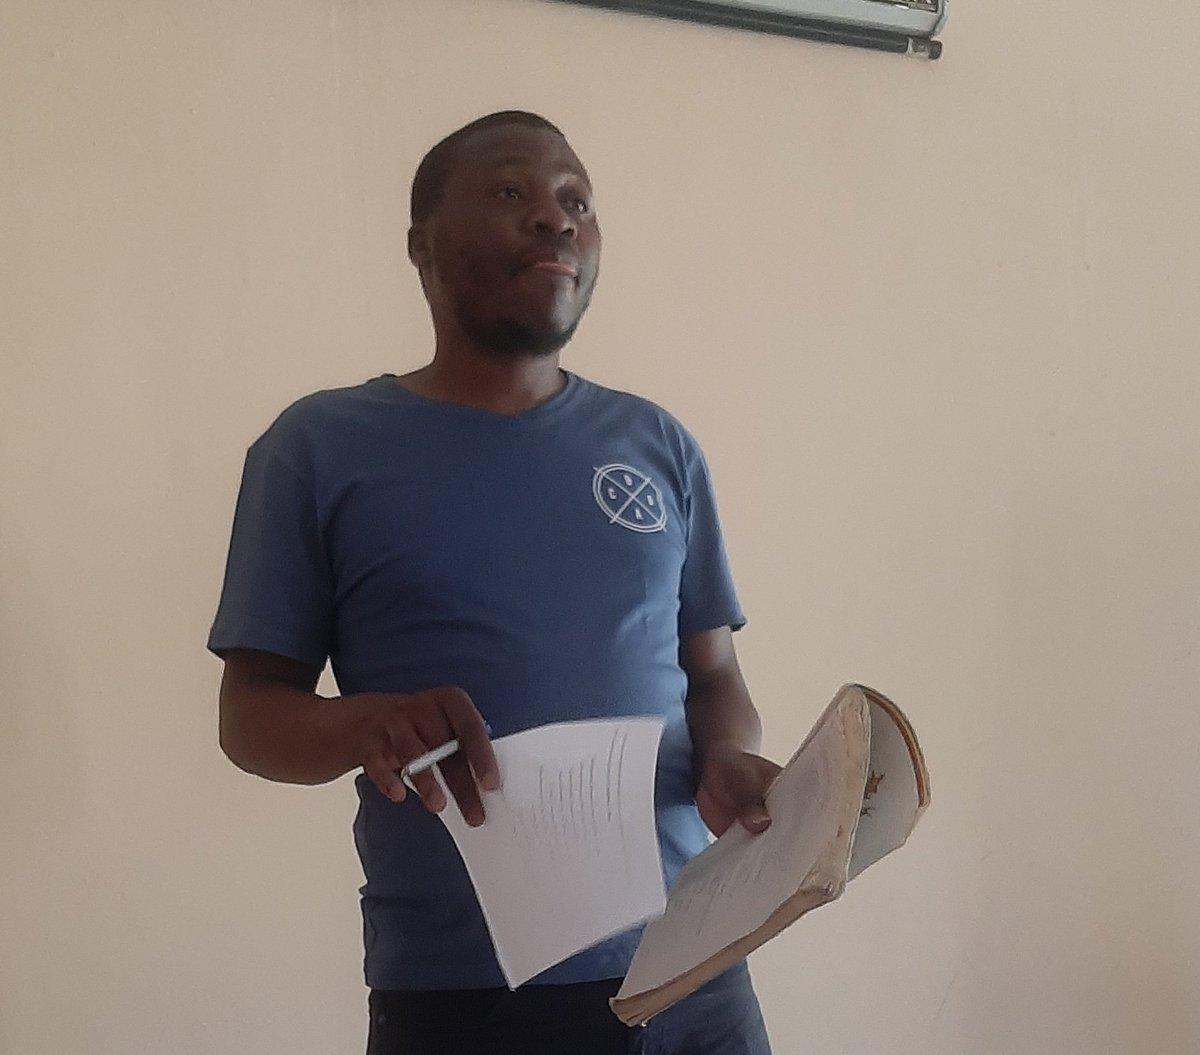 test Twitter Media - Communication Specialist Kumbirai Mufunda sharing perspectives on SOGIE reporting and the Constitution  in Zimbabwe @ejcnet @SwedeninZW @PitchZimbabwe @rhrnzw @thestandardzim @BelMataz @SaProgs @teddymunyimani https://t.co/5Tmc1Z2hOE